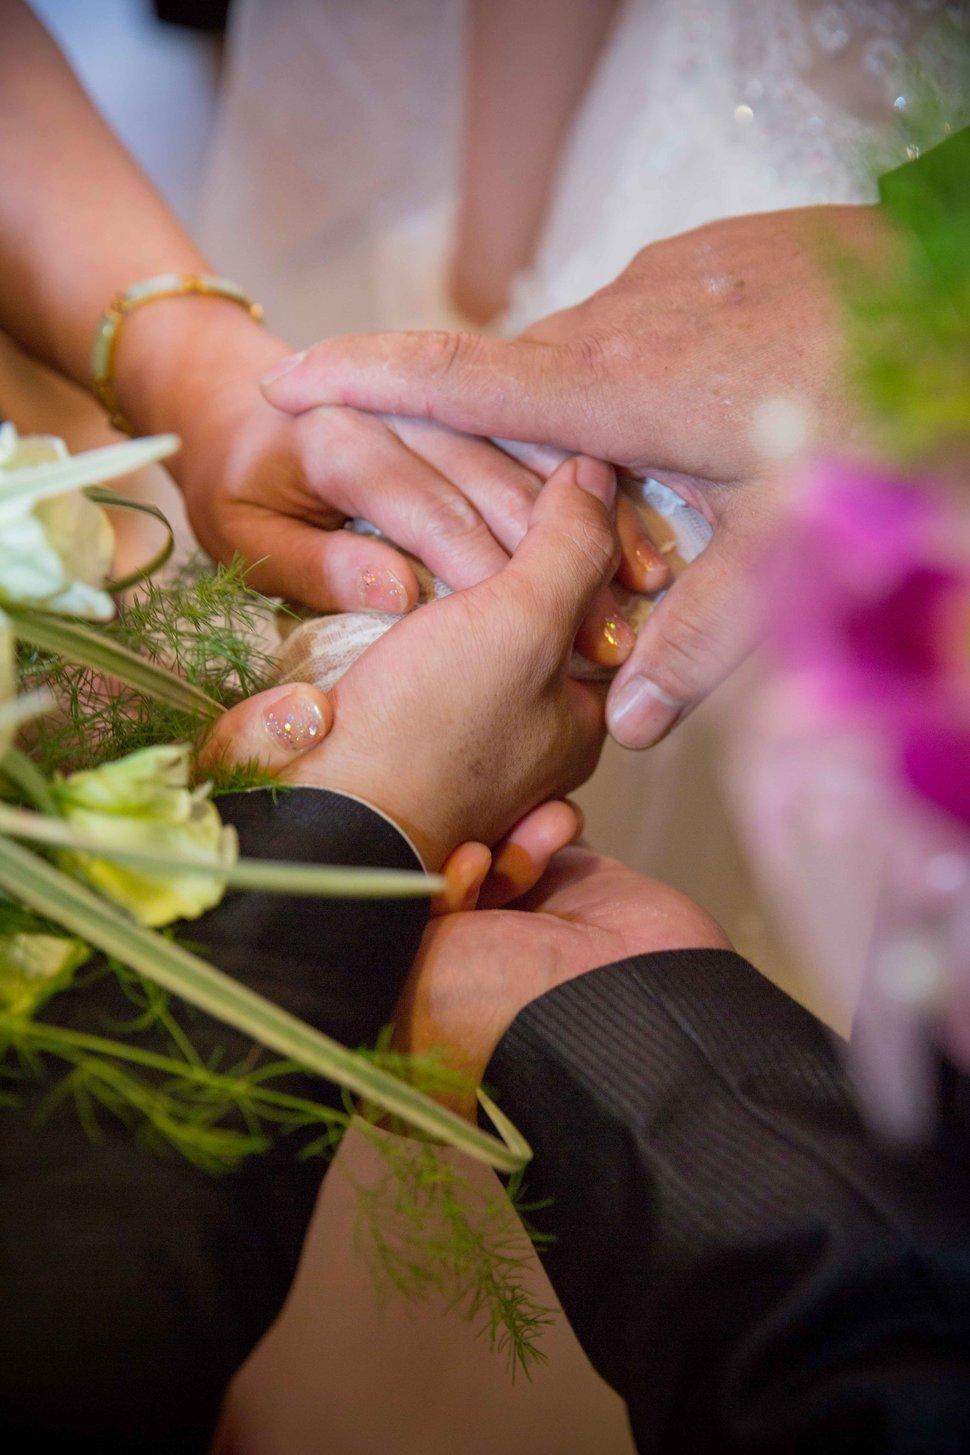 CT 詠翰&穎珊(編號:429602) - CT studio - 結婚吧